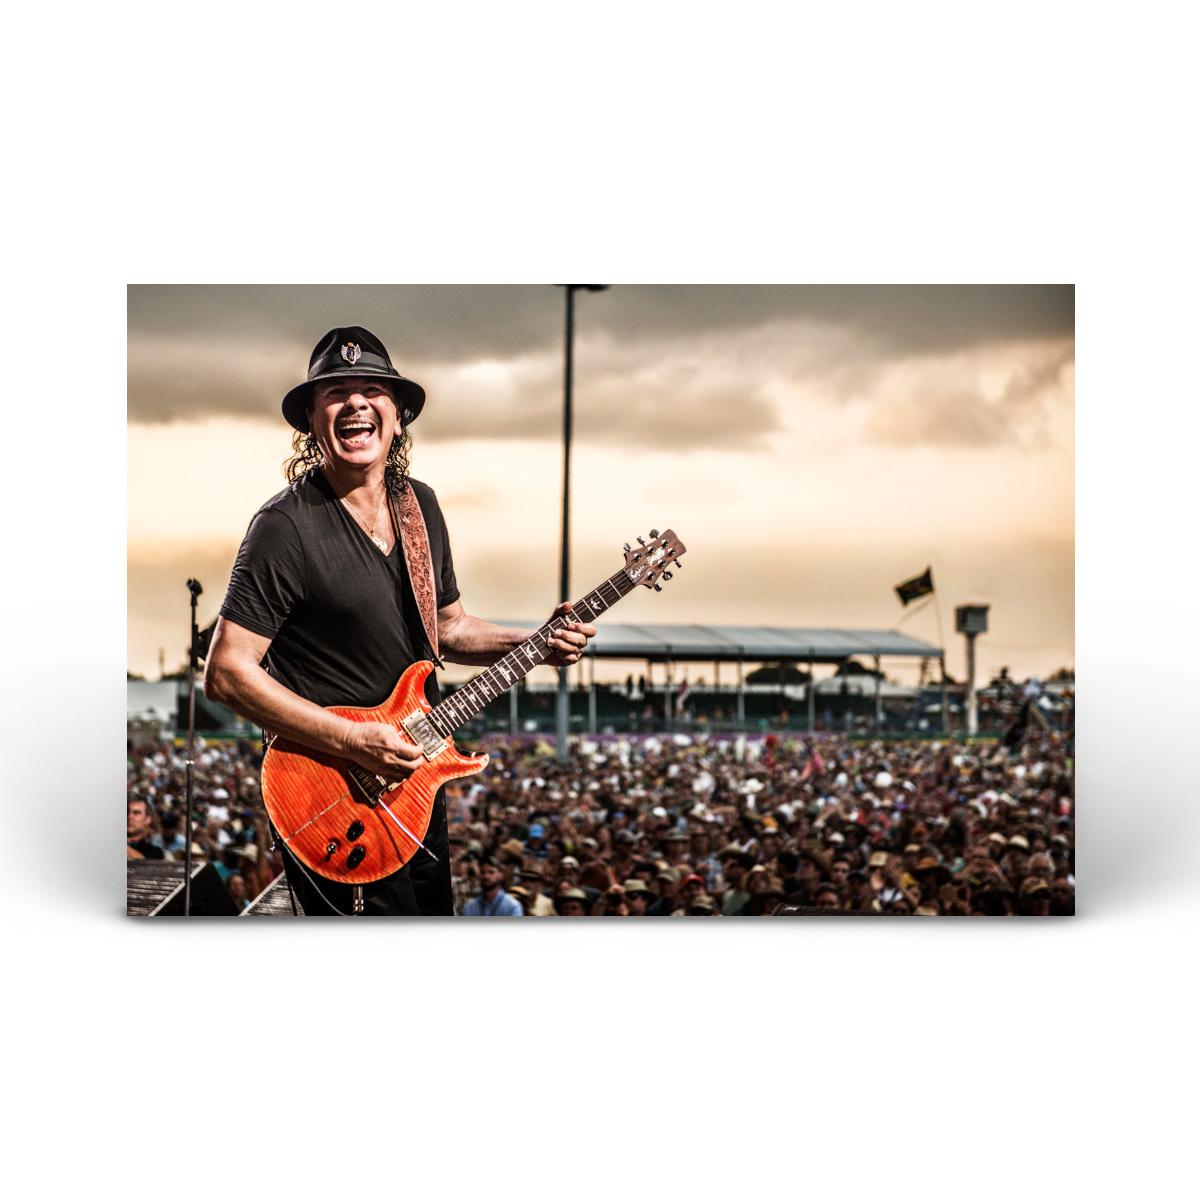 Carlos Santana on Stage